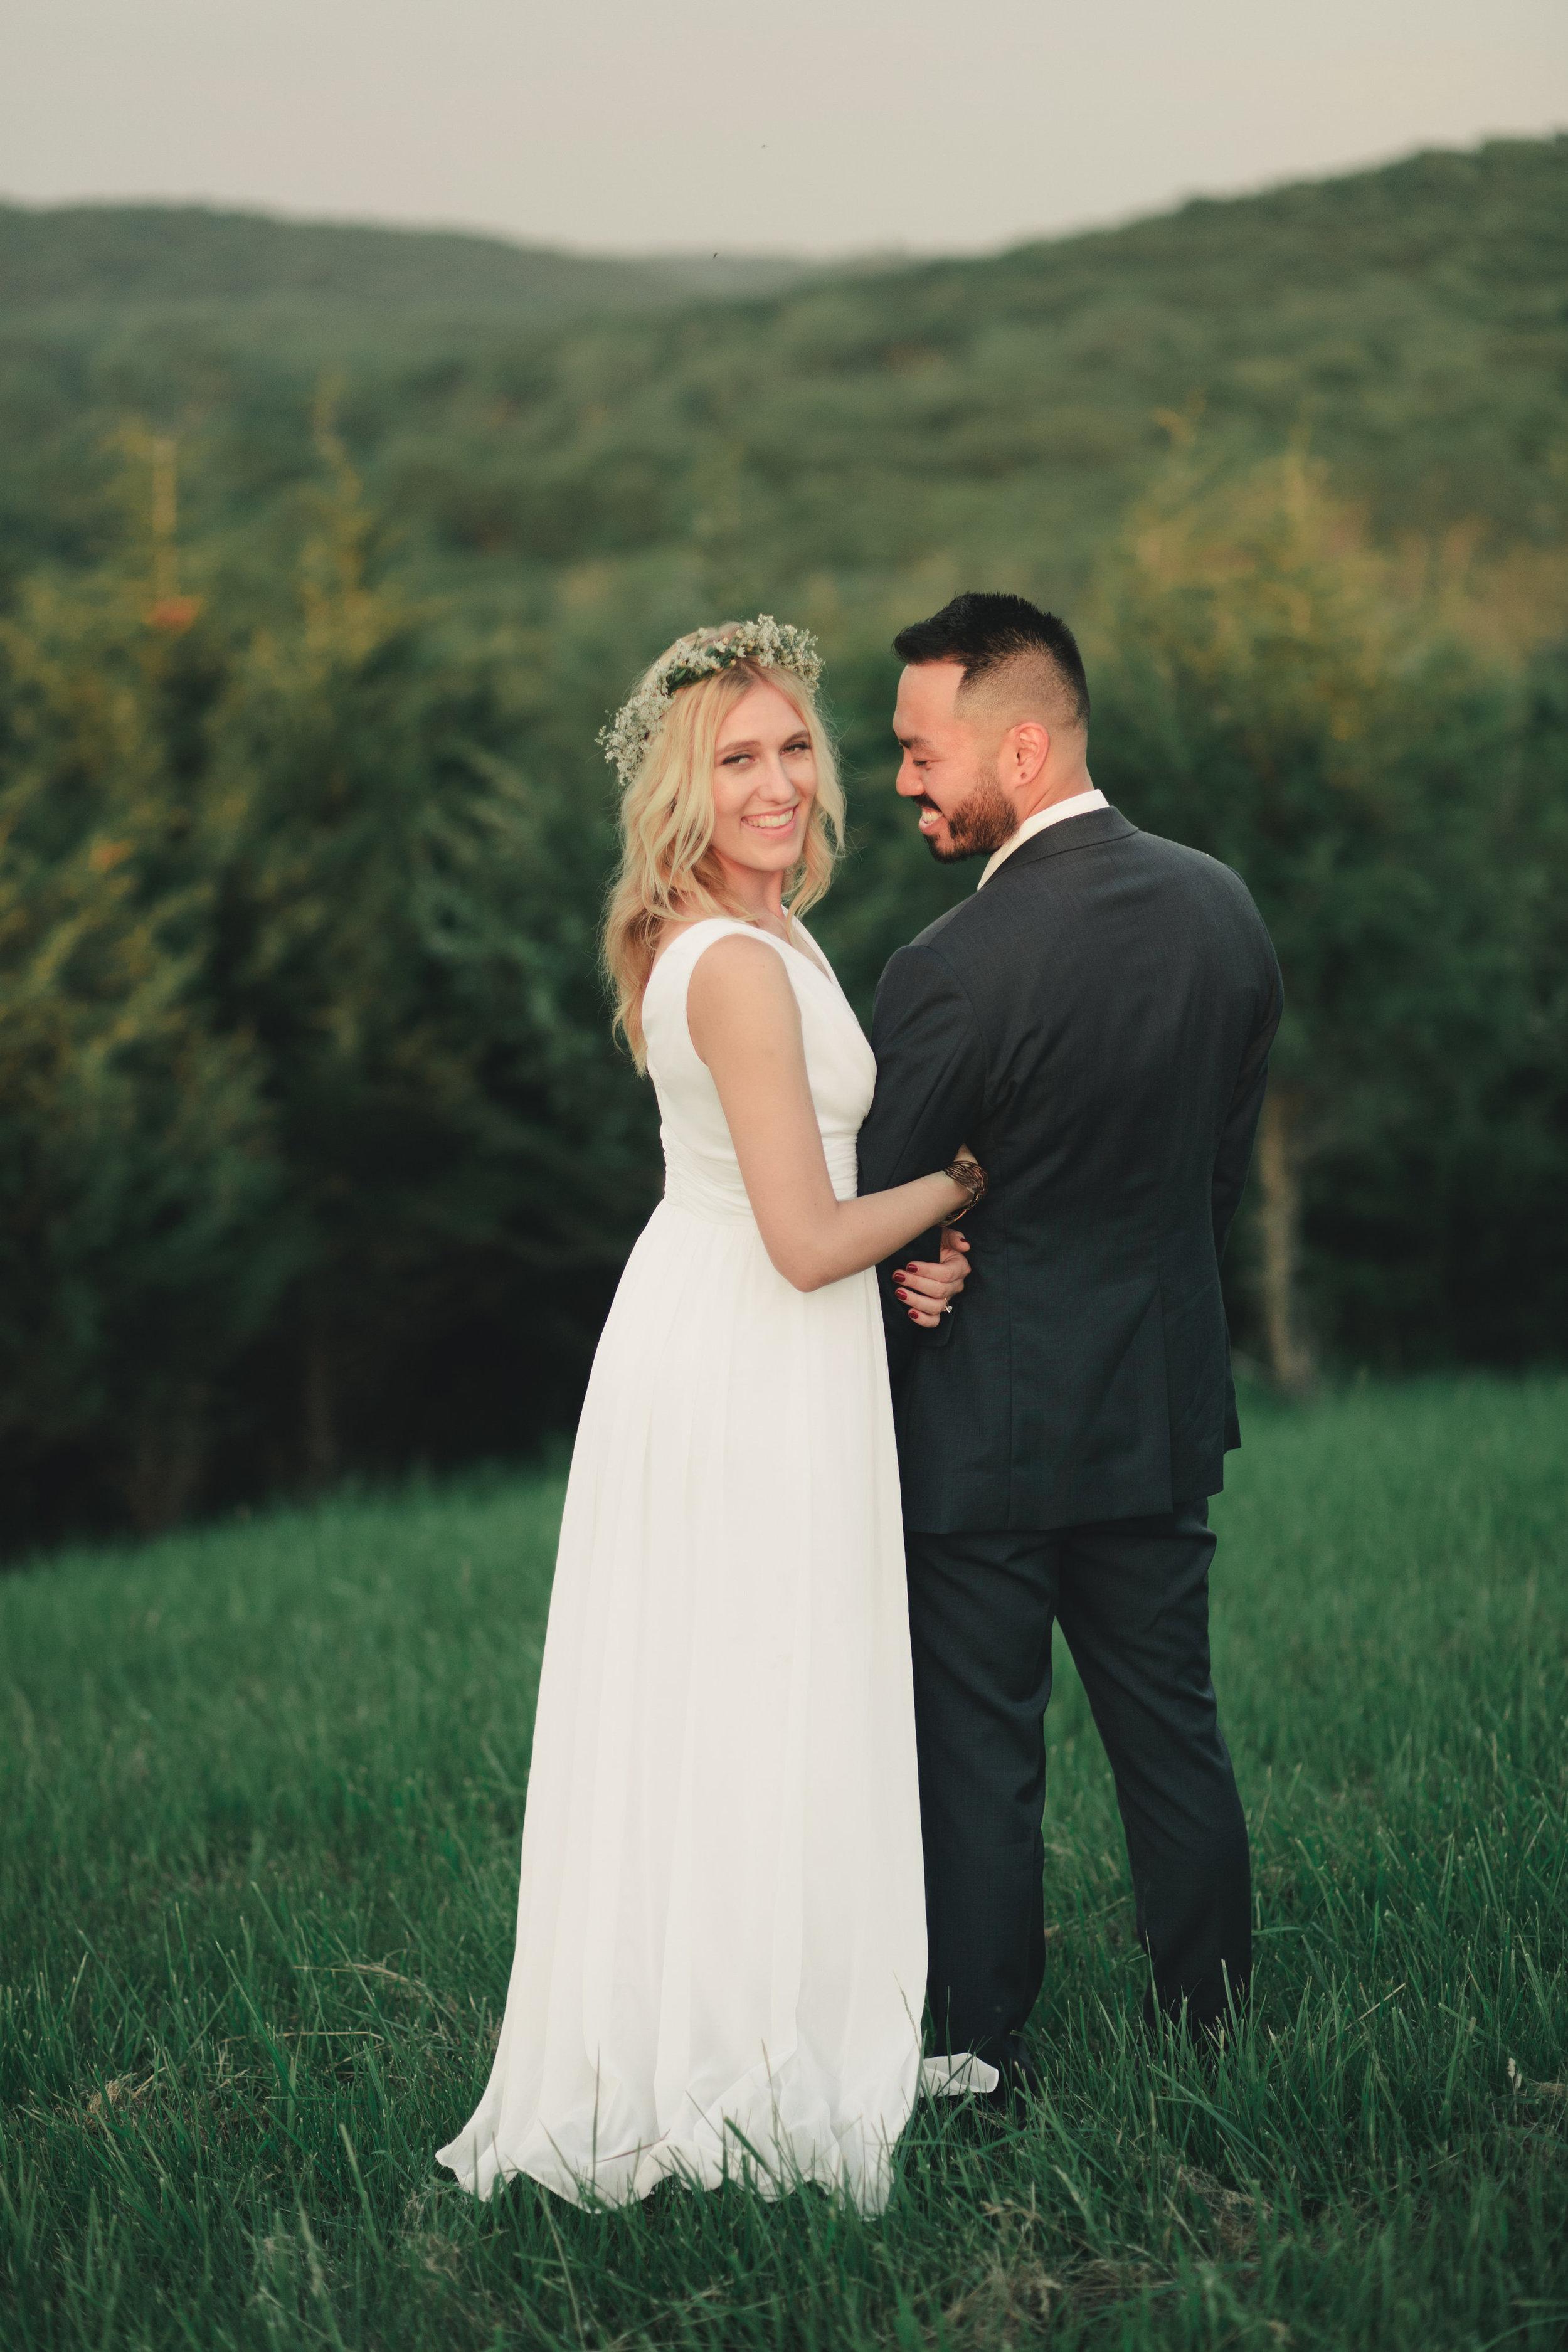 Emily and Zach-Wedding Finals 2-0128.jpg